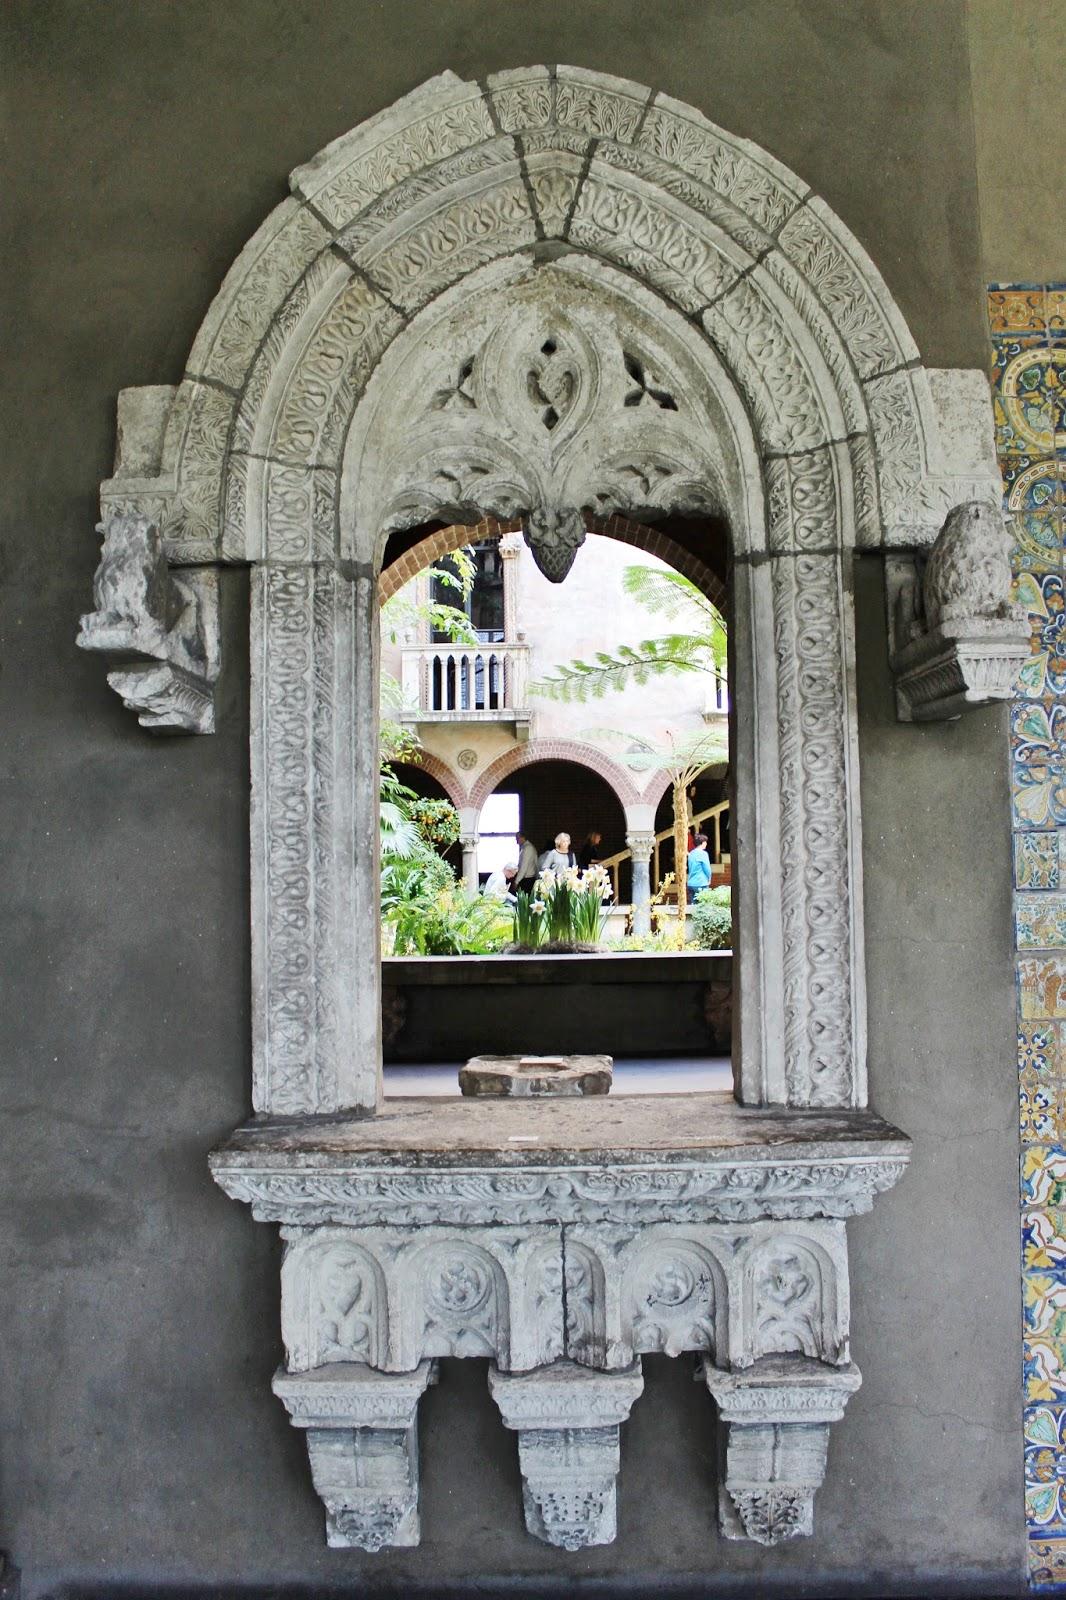 bijuleni - Isabella Gardner Museum Courtyard Garden, Boston